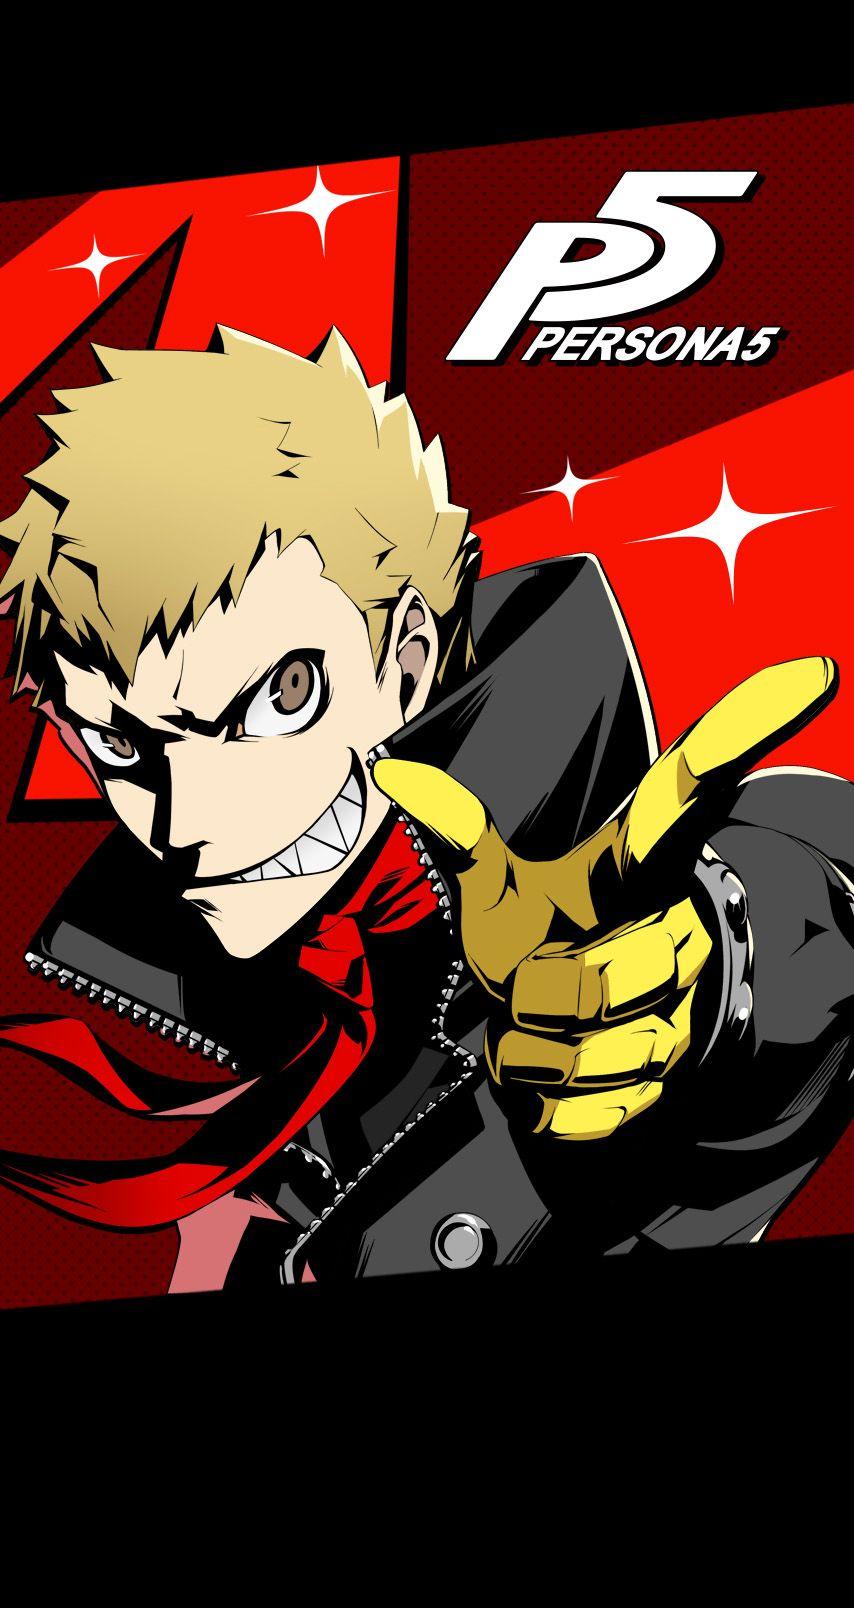 Persona 5 Ryuji Sakamoto Persona 5 Persona 5 Joker Persona